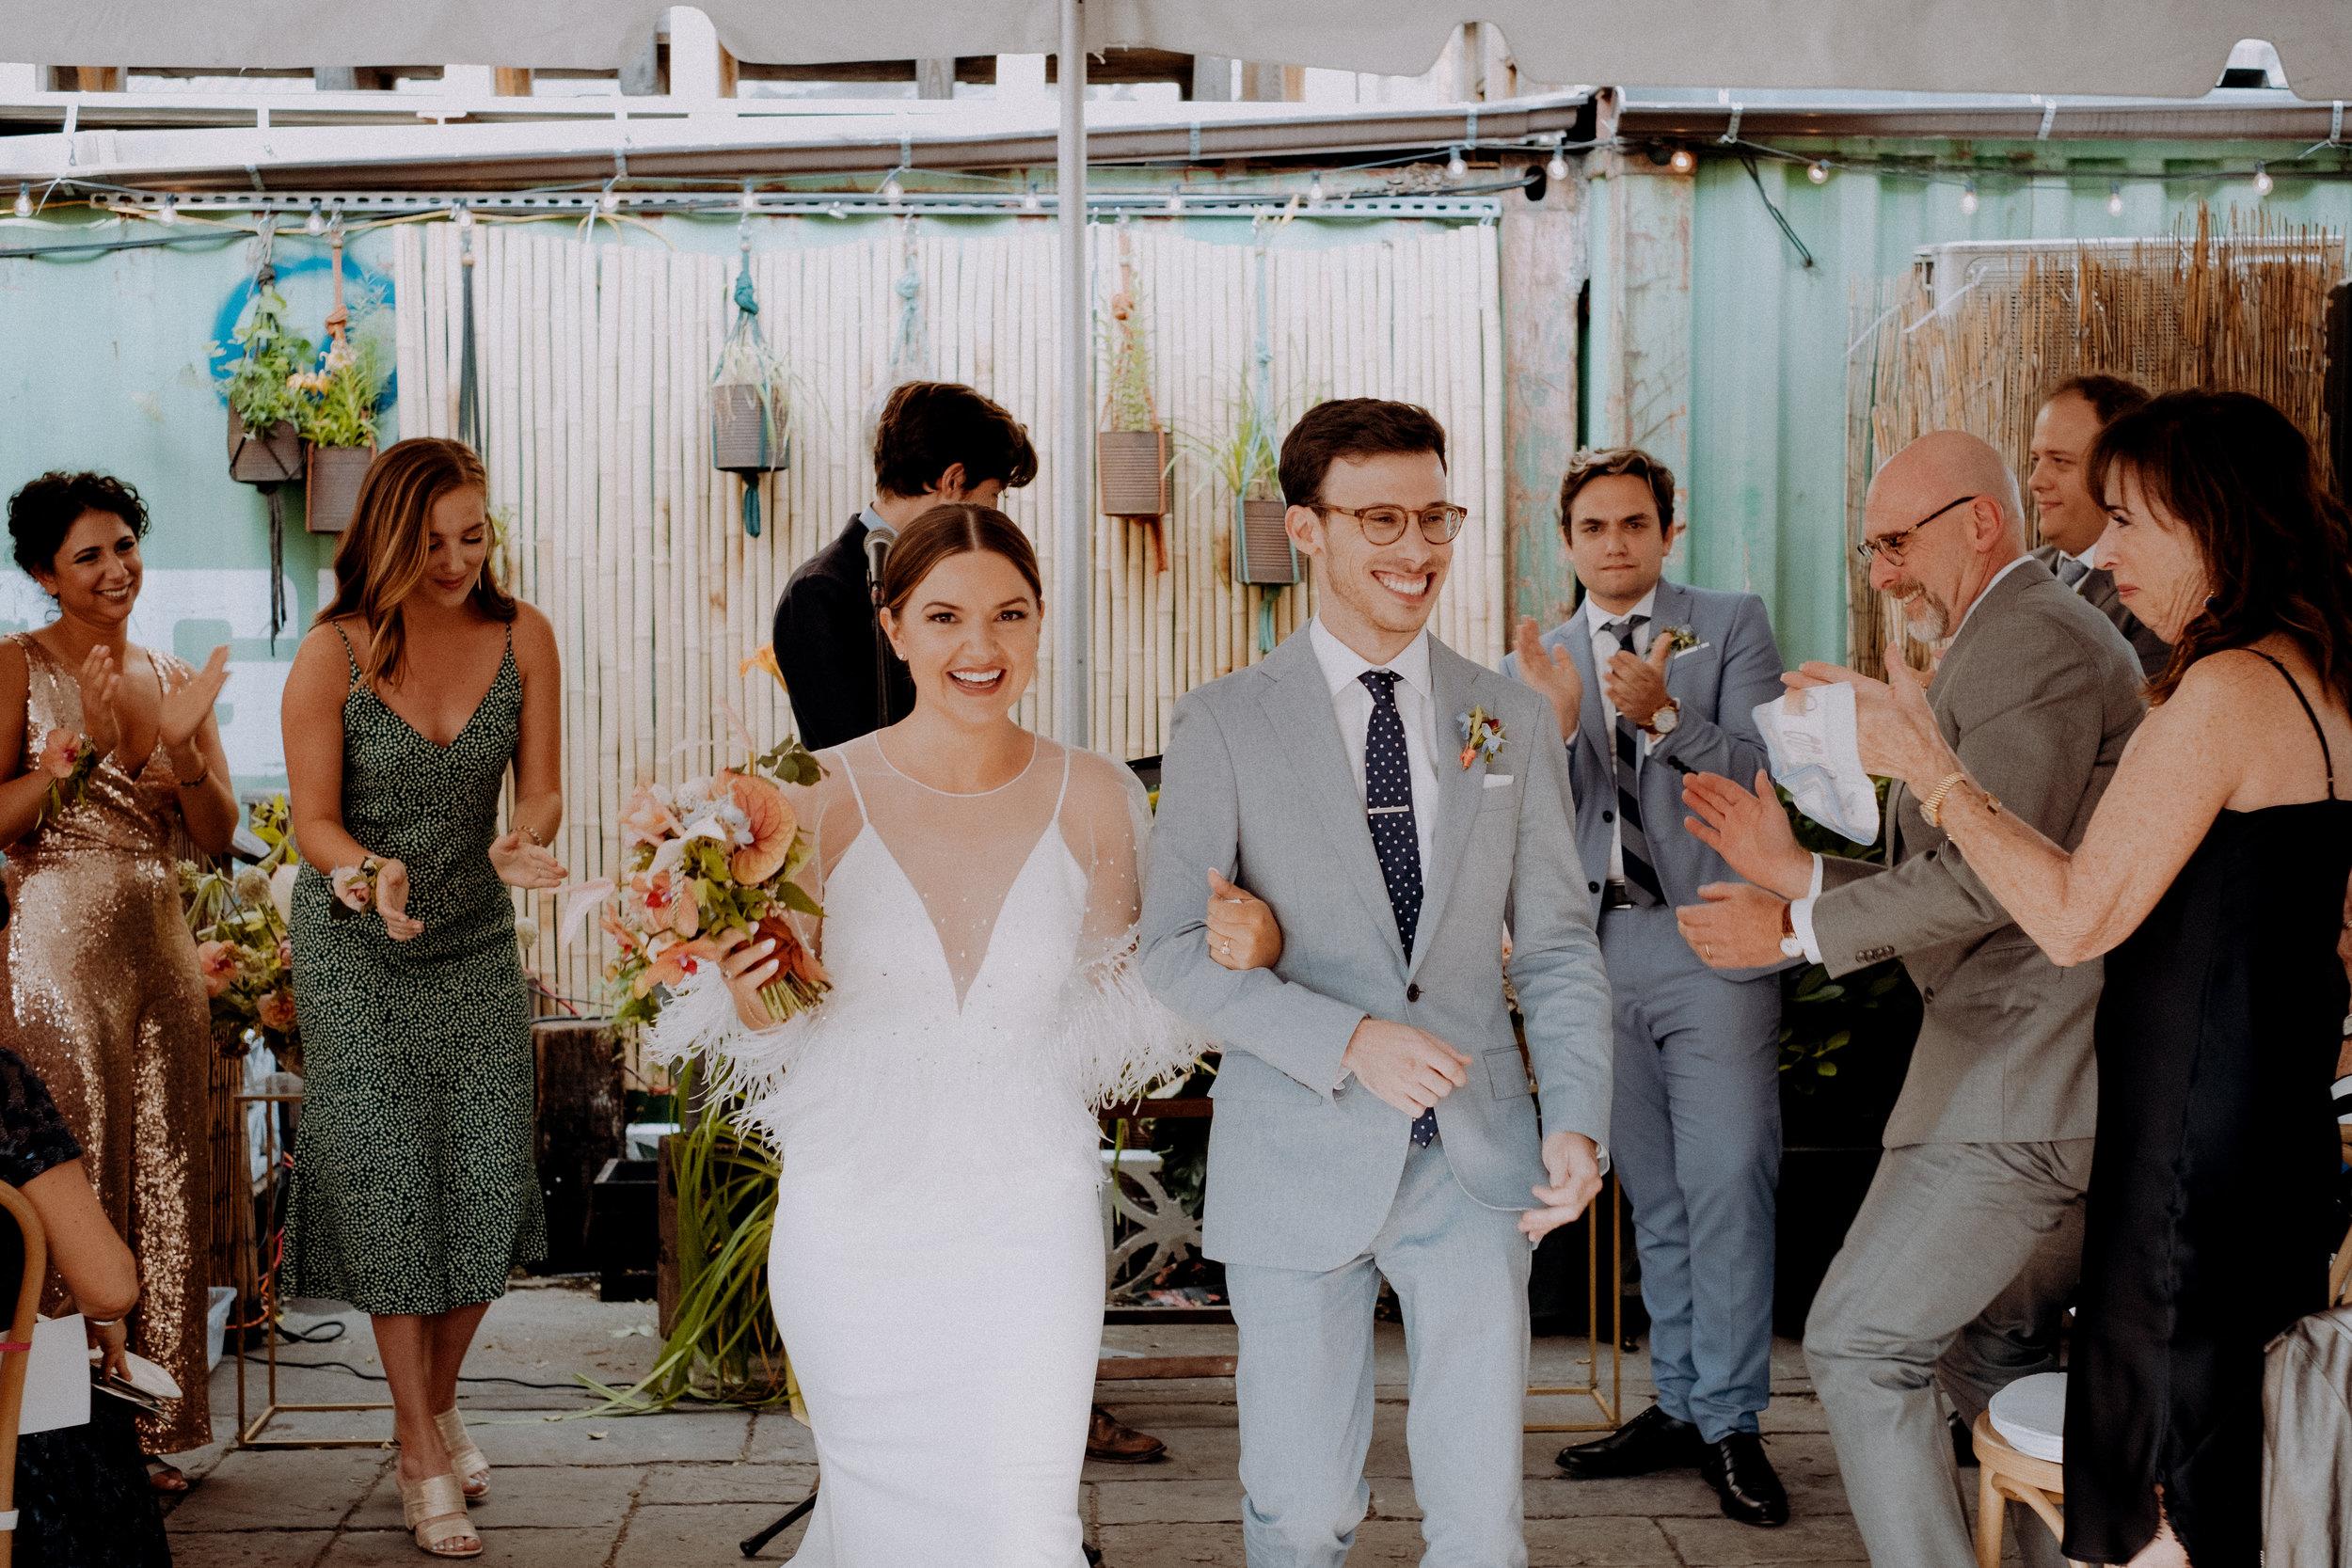 Chellise_Michael_Photography_Robertas_Brooklyn_Wedding_Photographer-506.jpg